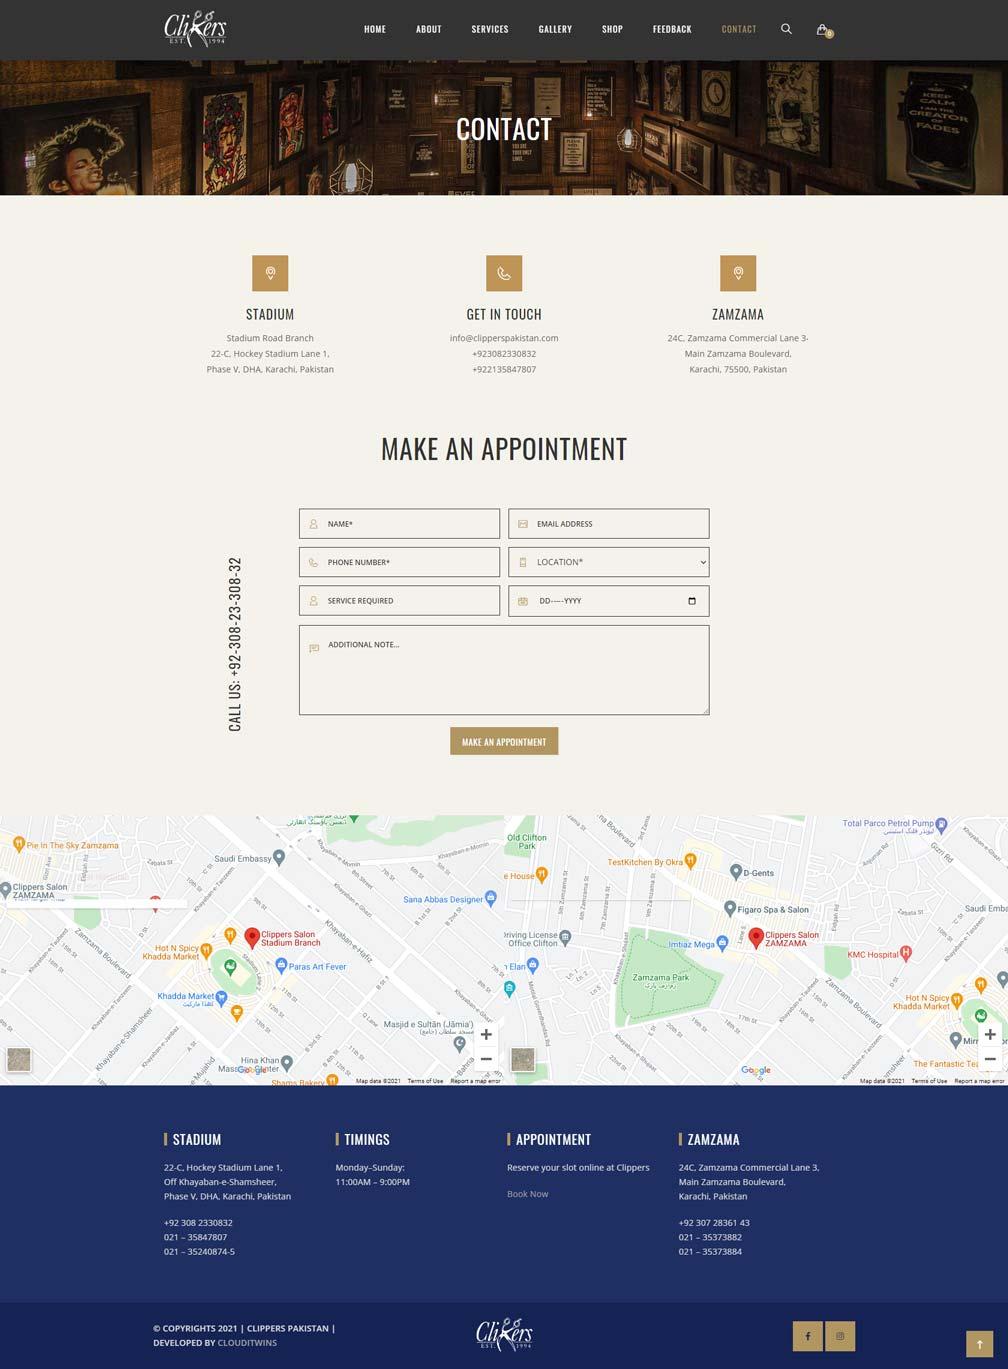 Clippers salon store website development